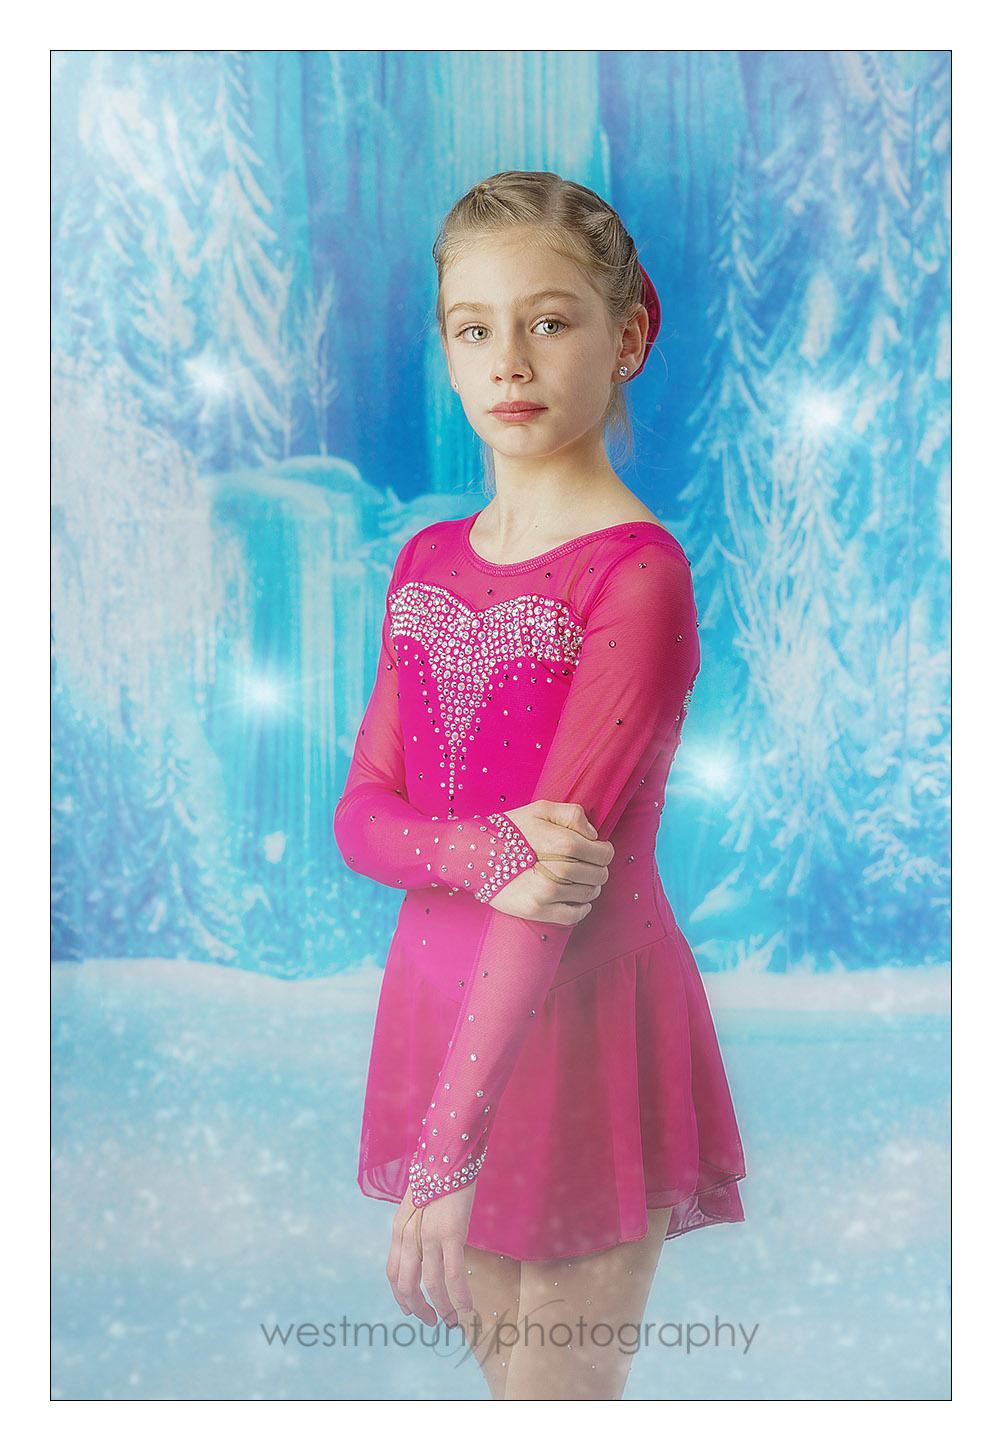 In studio figure skater photography…